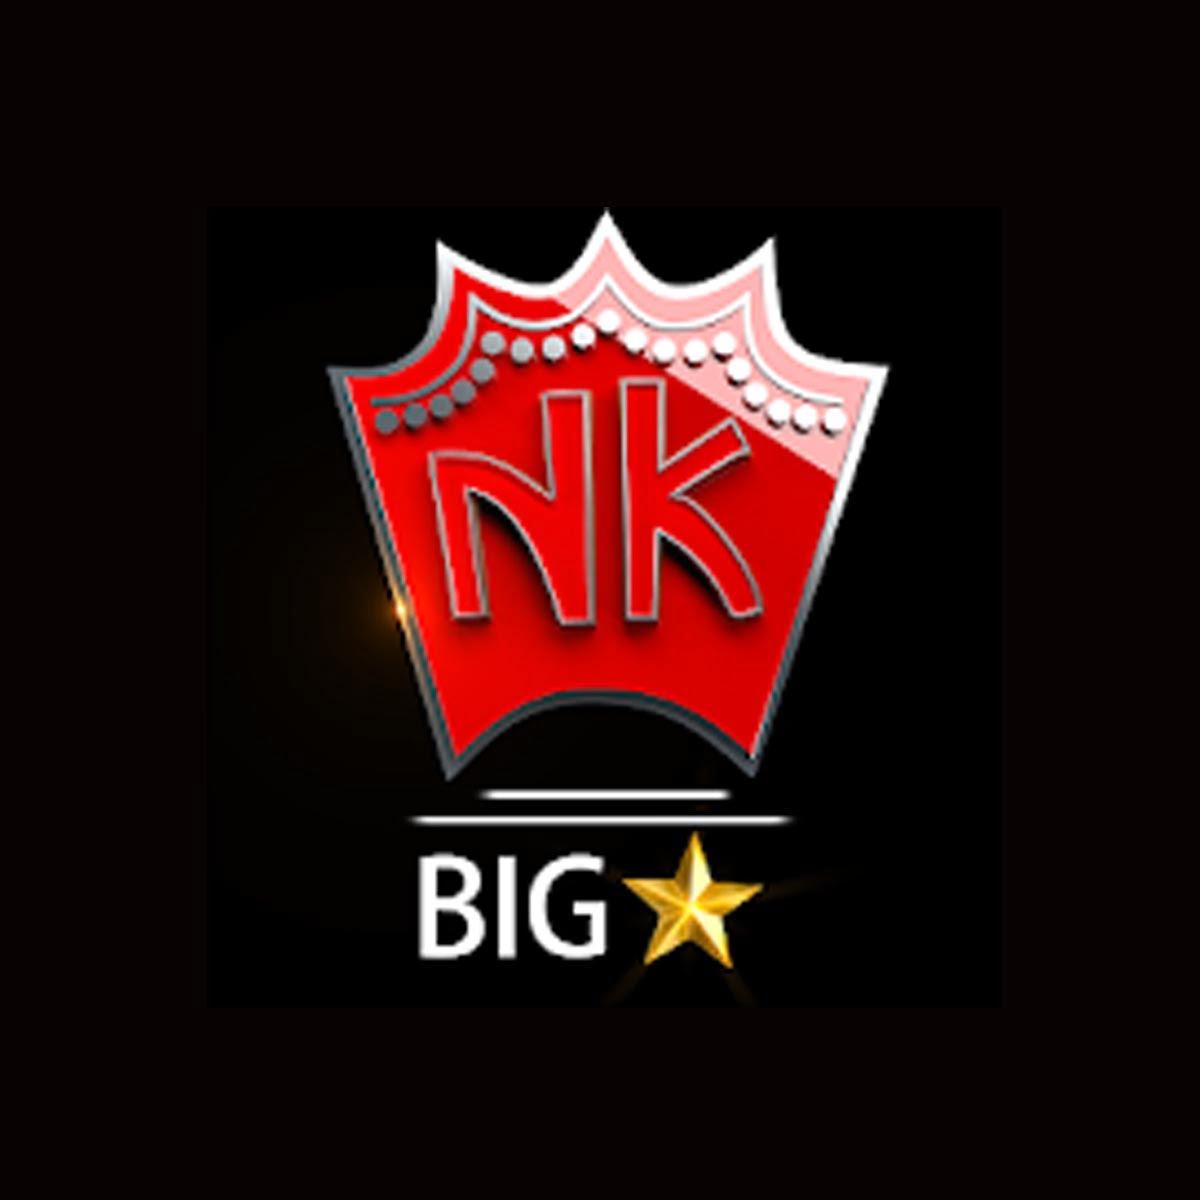 NK Big Star